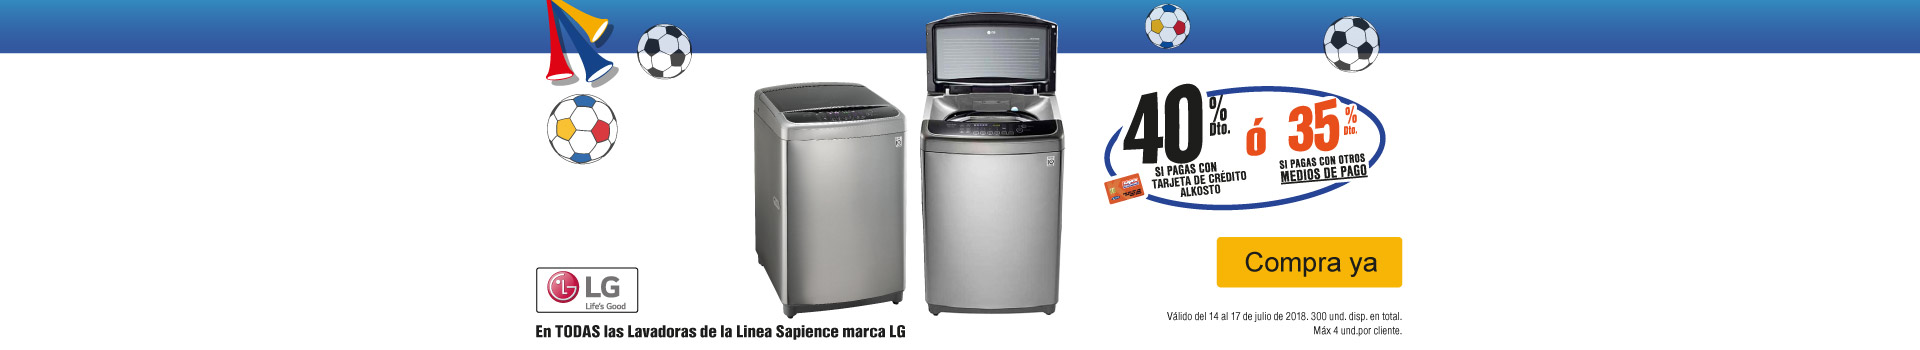 AK-KT-HIPER-1-LB-ELECT-PP-LG-LAVADORA-SAPIENCE-JULIO-14